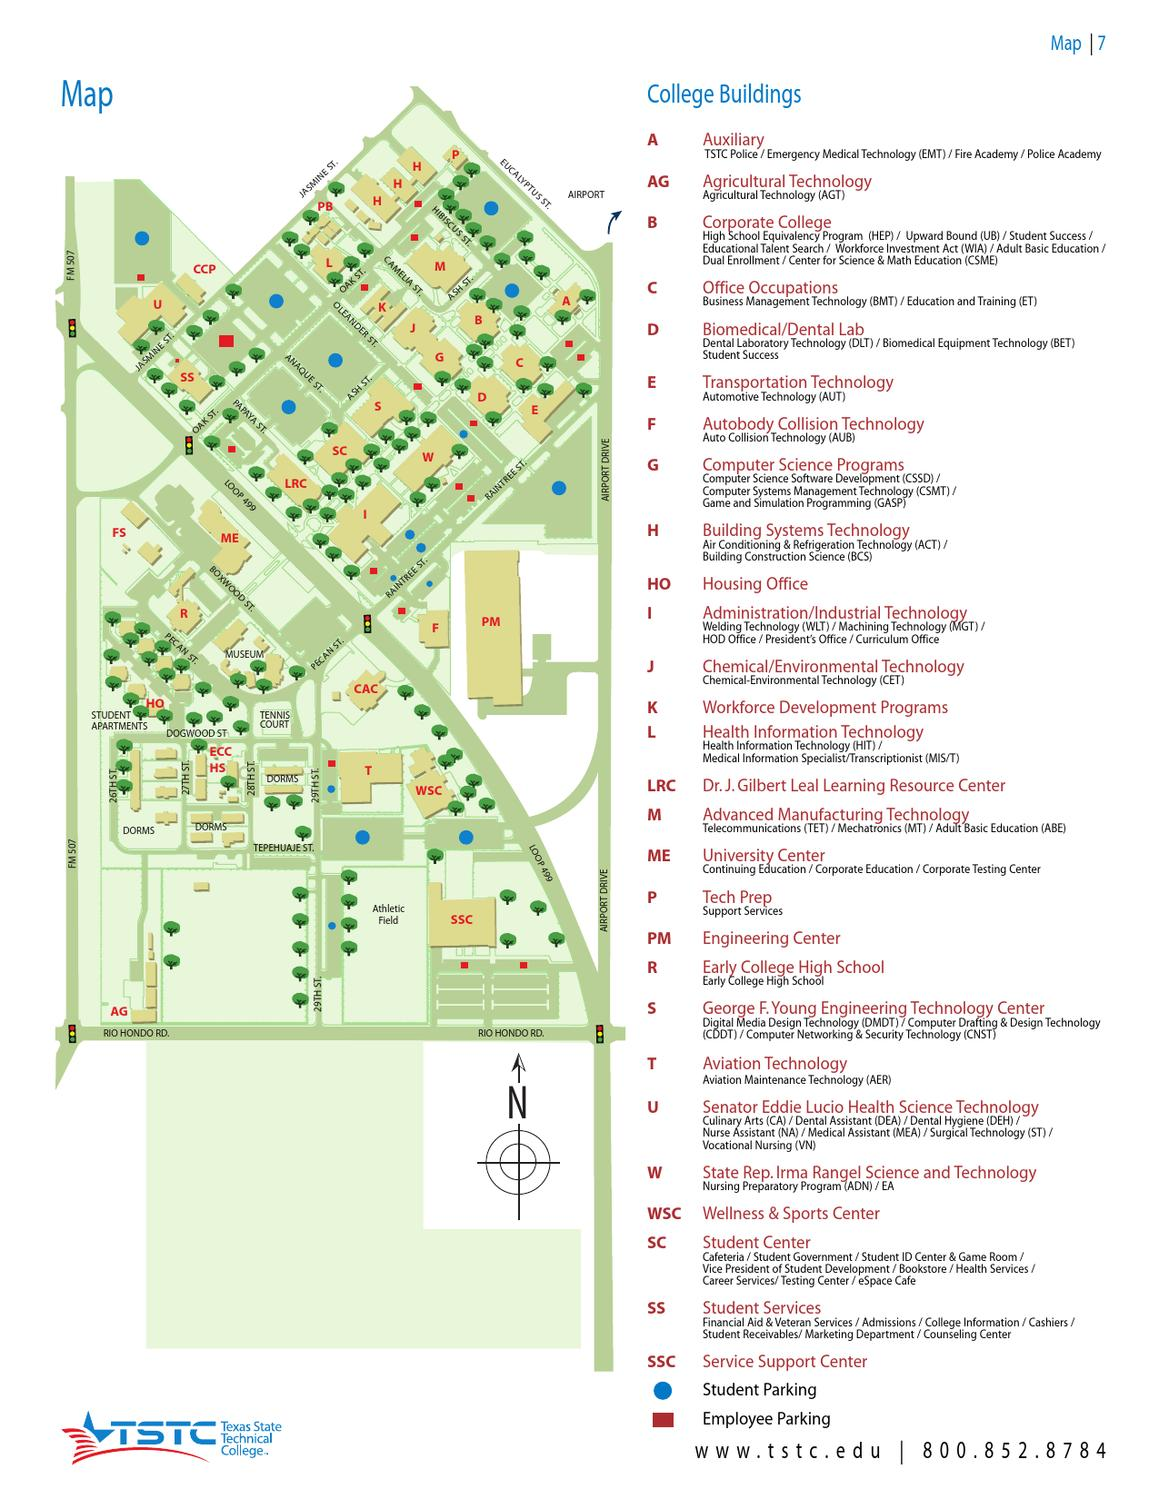 tstc harlingen campus map Catalog 2012 2014 By Texas State Technical College Issuu tstc harlingen campus map